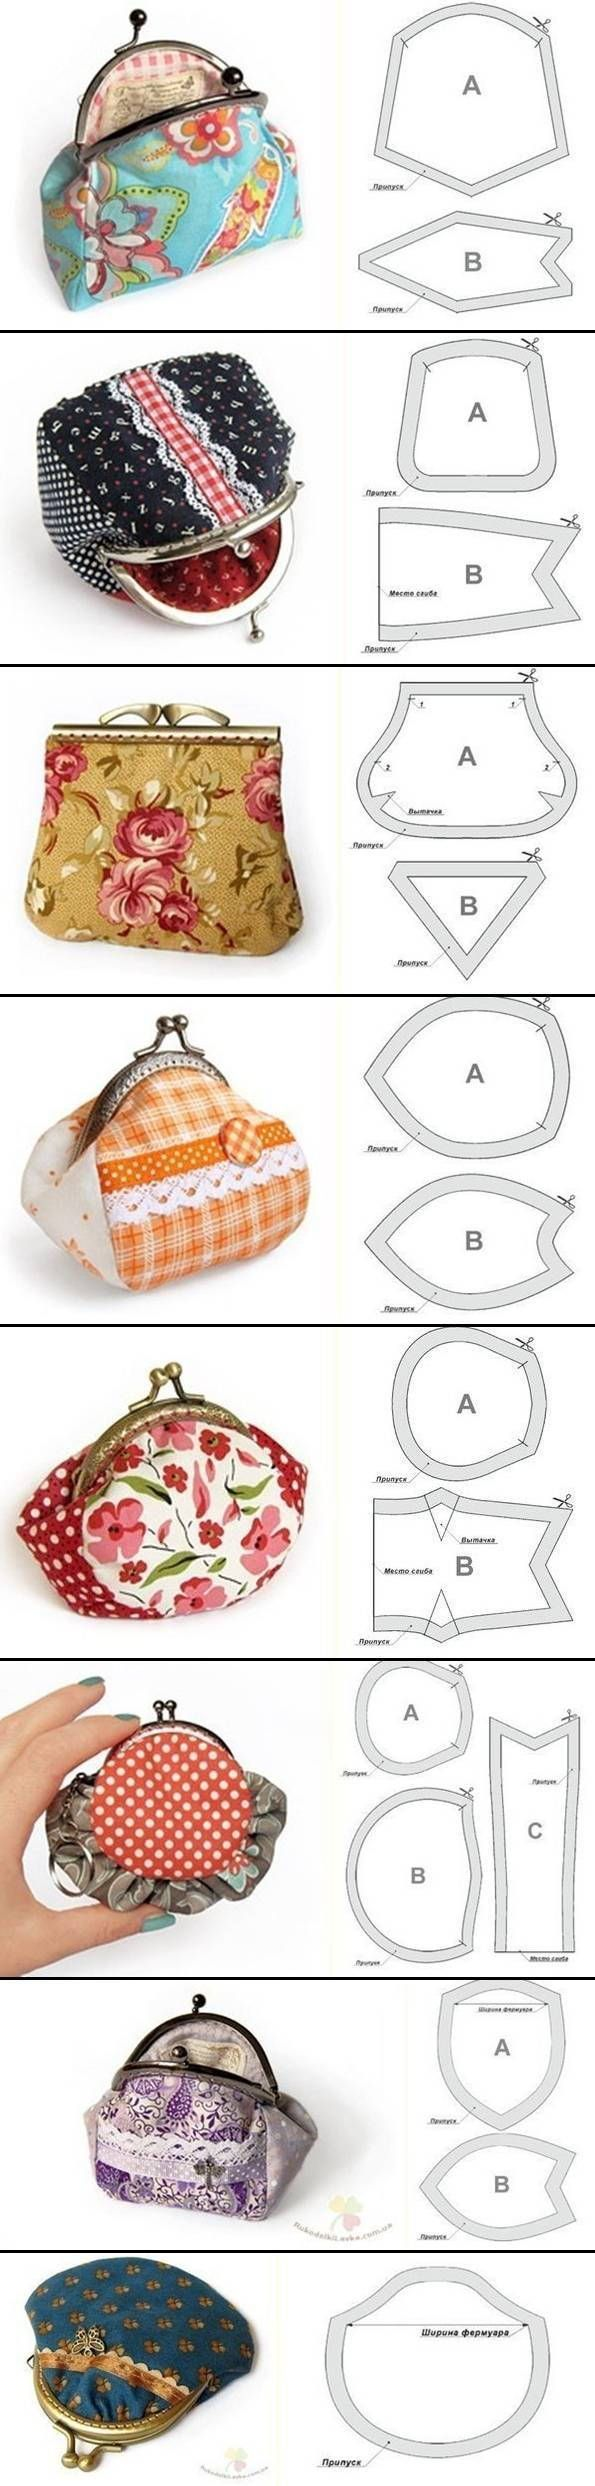 Kako da napravite svoju vintage tašnicu?/  How to make your own vintage purse? #tašnice DIY Cute Purse Templates